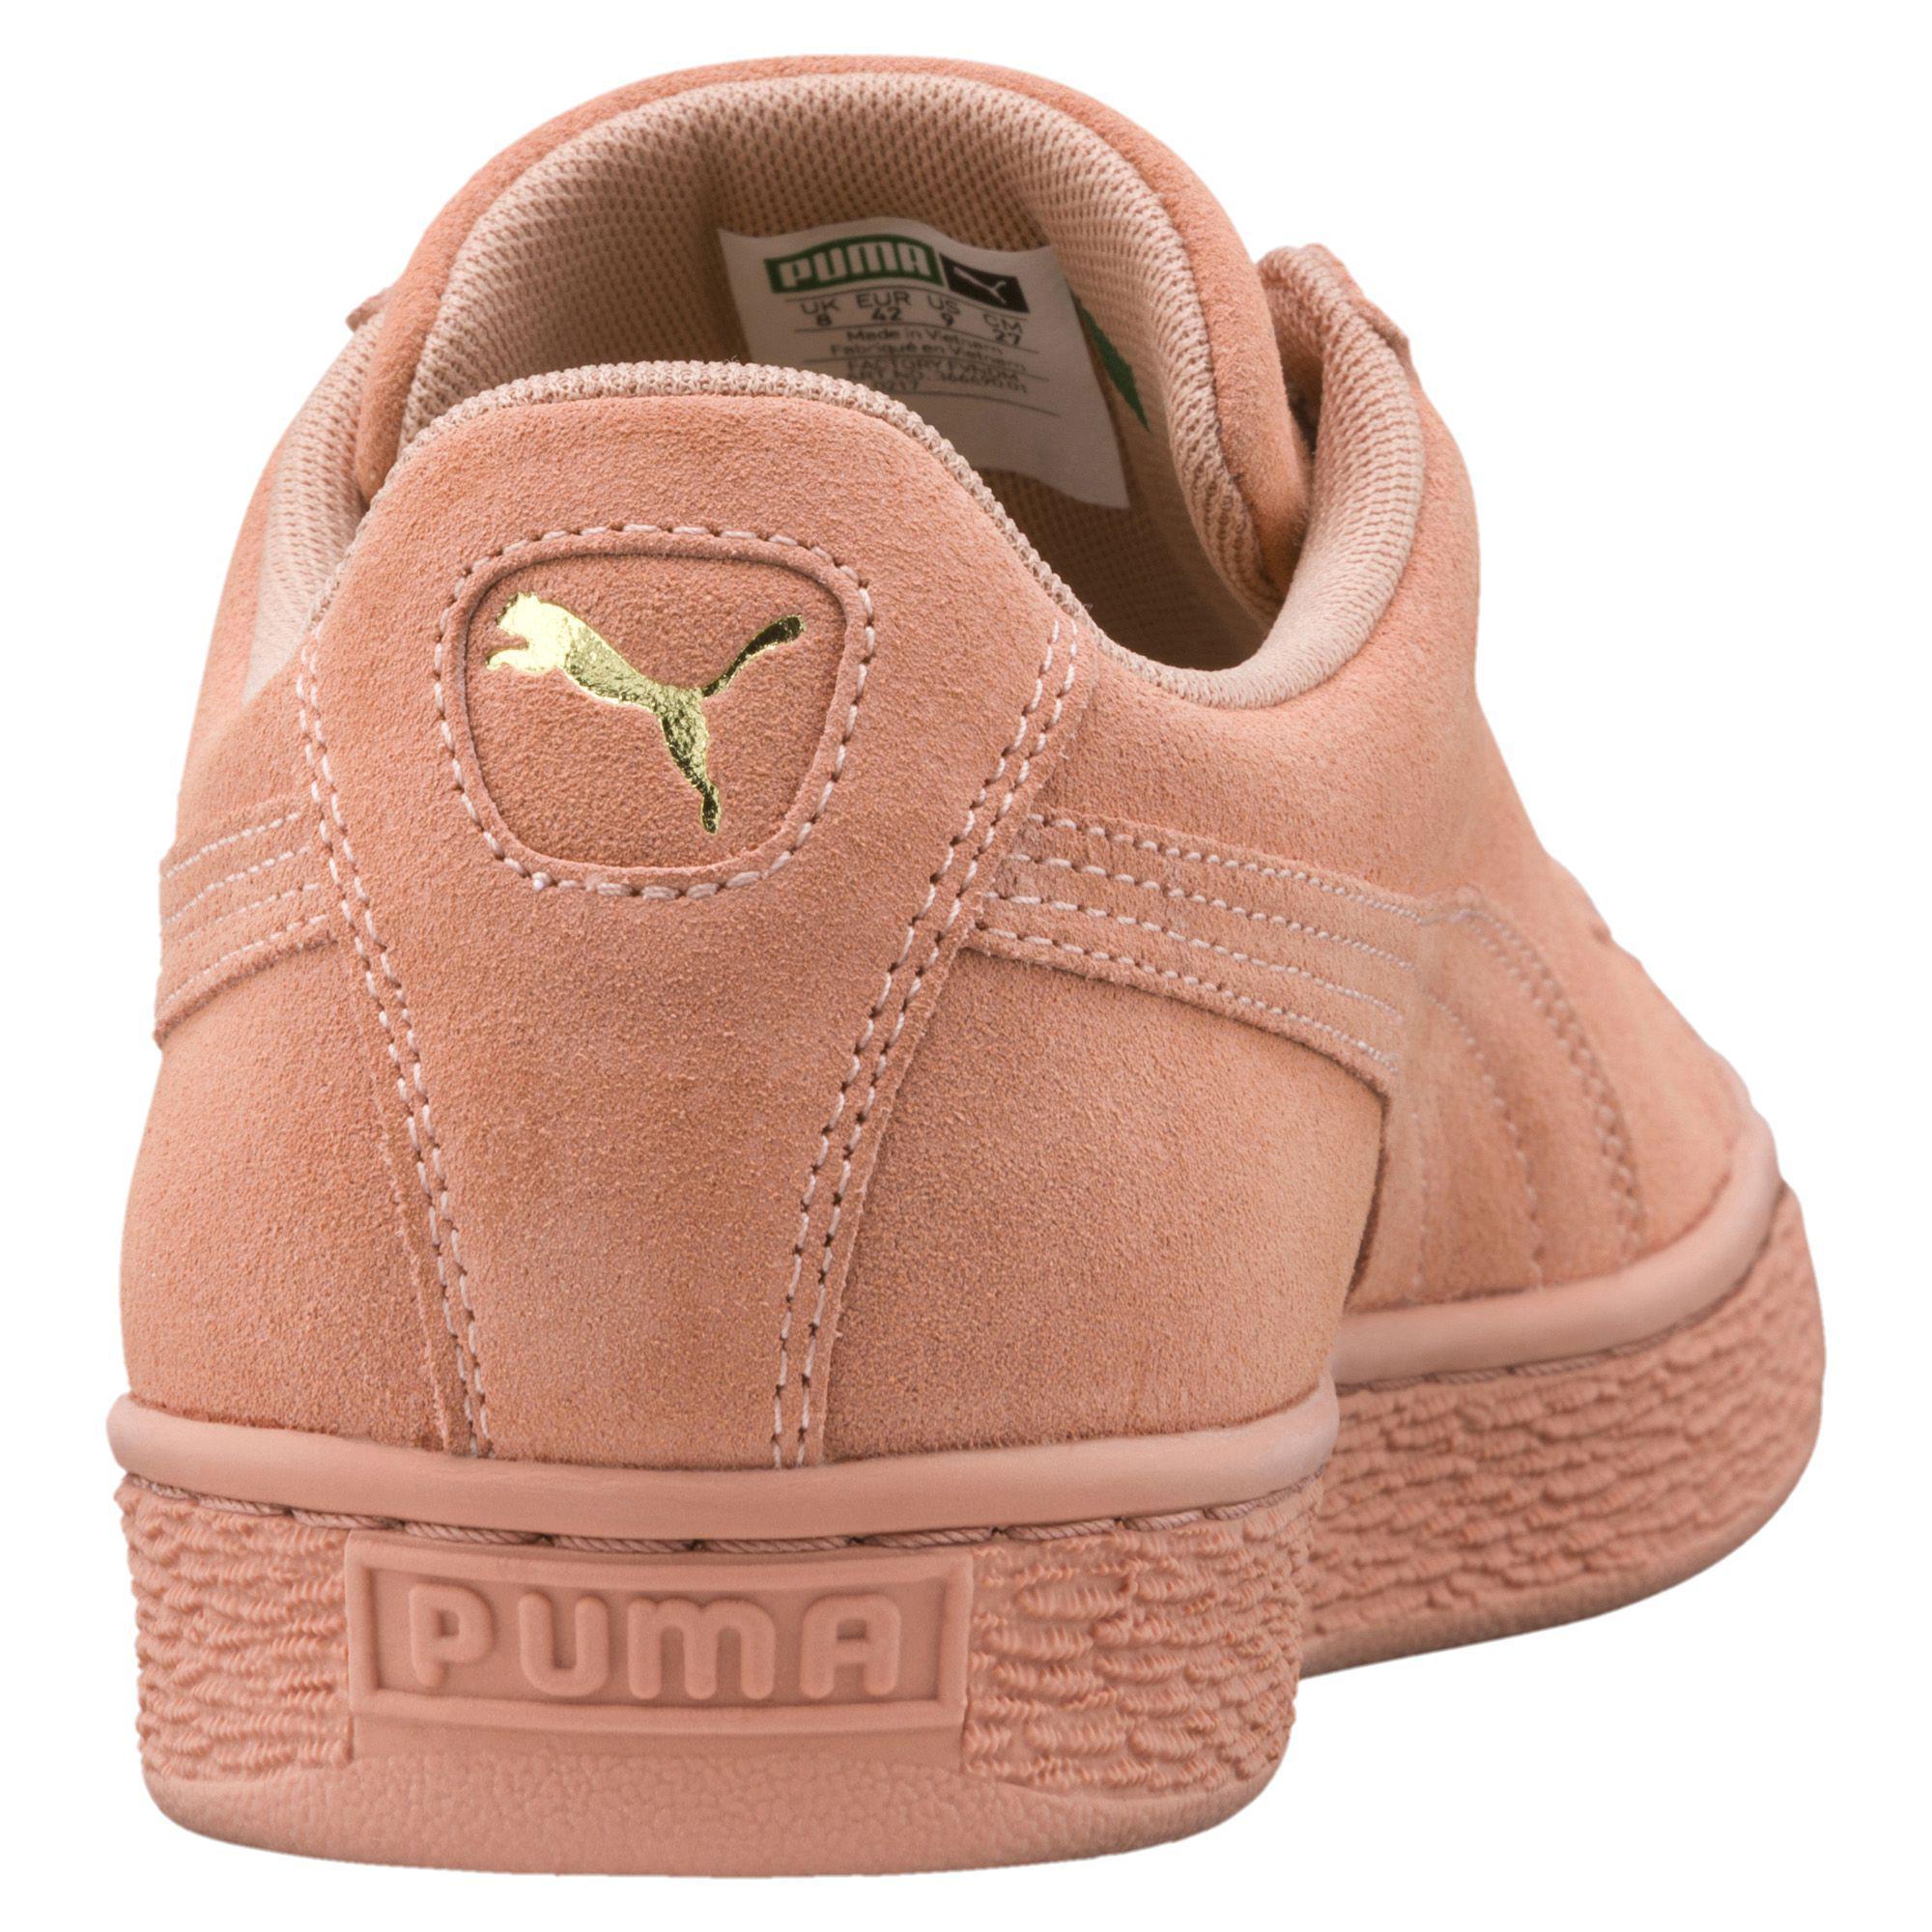 74a1573849 ... PUMA - Pink Suede Classic Tonal Sneakers - Lyst. View fullscreen huge  discount b7018 feedf ...